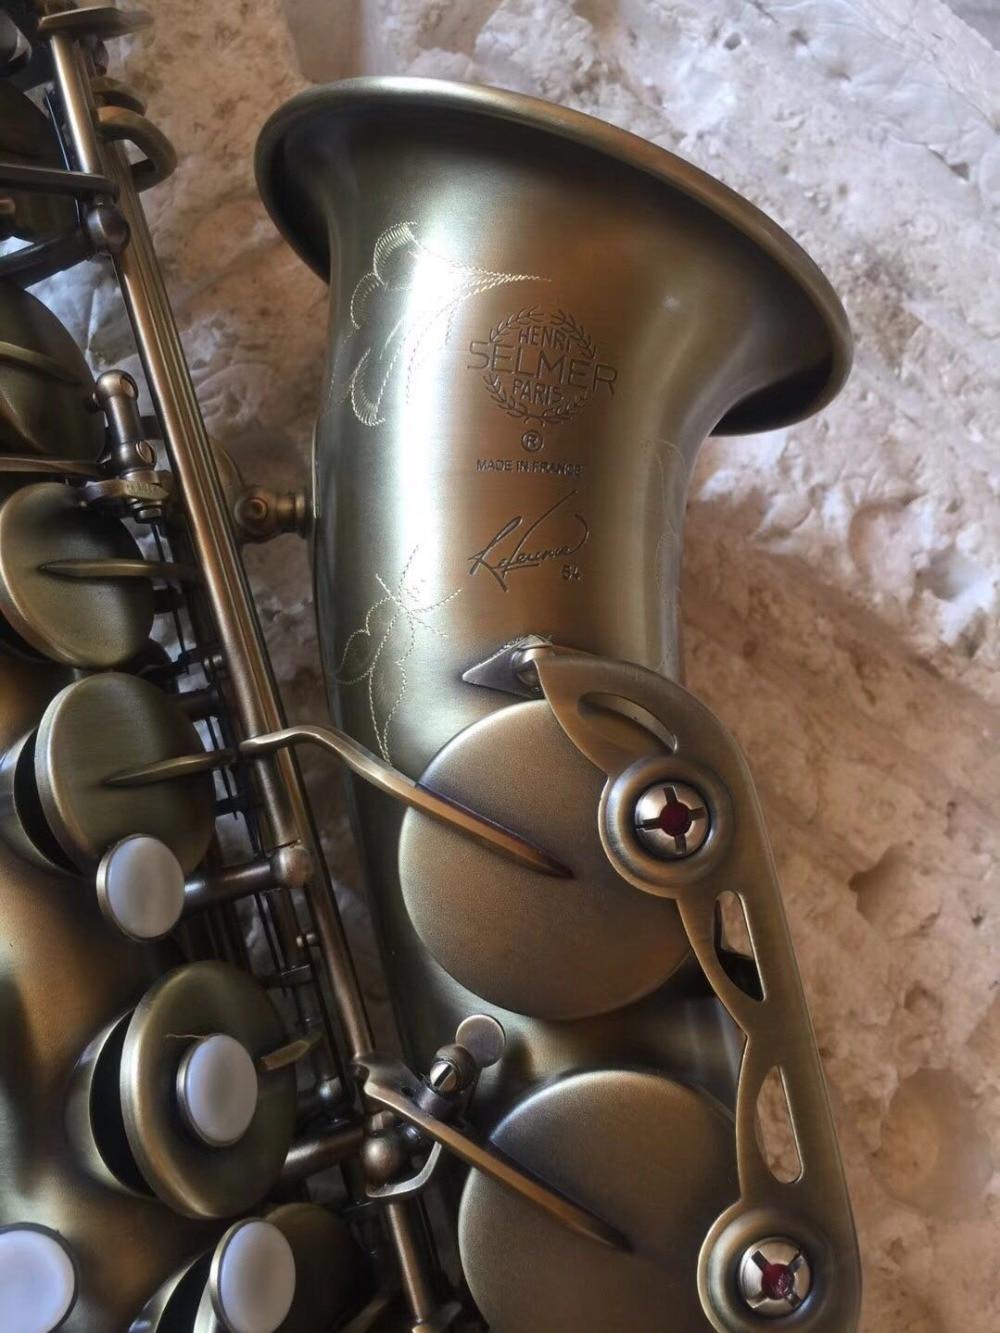 Selme 54 Model Alto Saxophone E-flat Sax Antique Copper Simulation Professional Brass Instruments + hard case music instruments france 54r alto saxophone e flat alto saxophone black nickel play professional brass saxophone free shipping